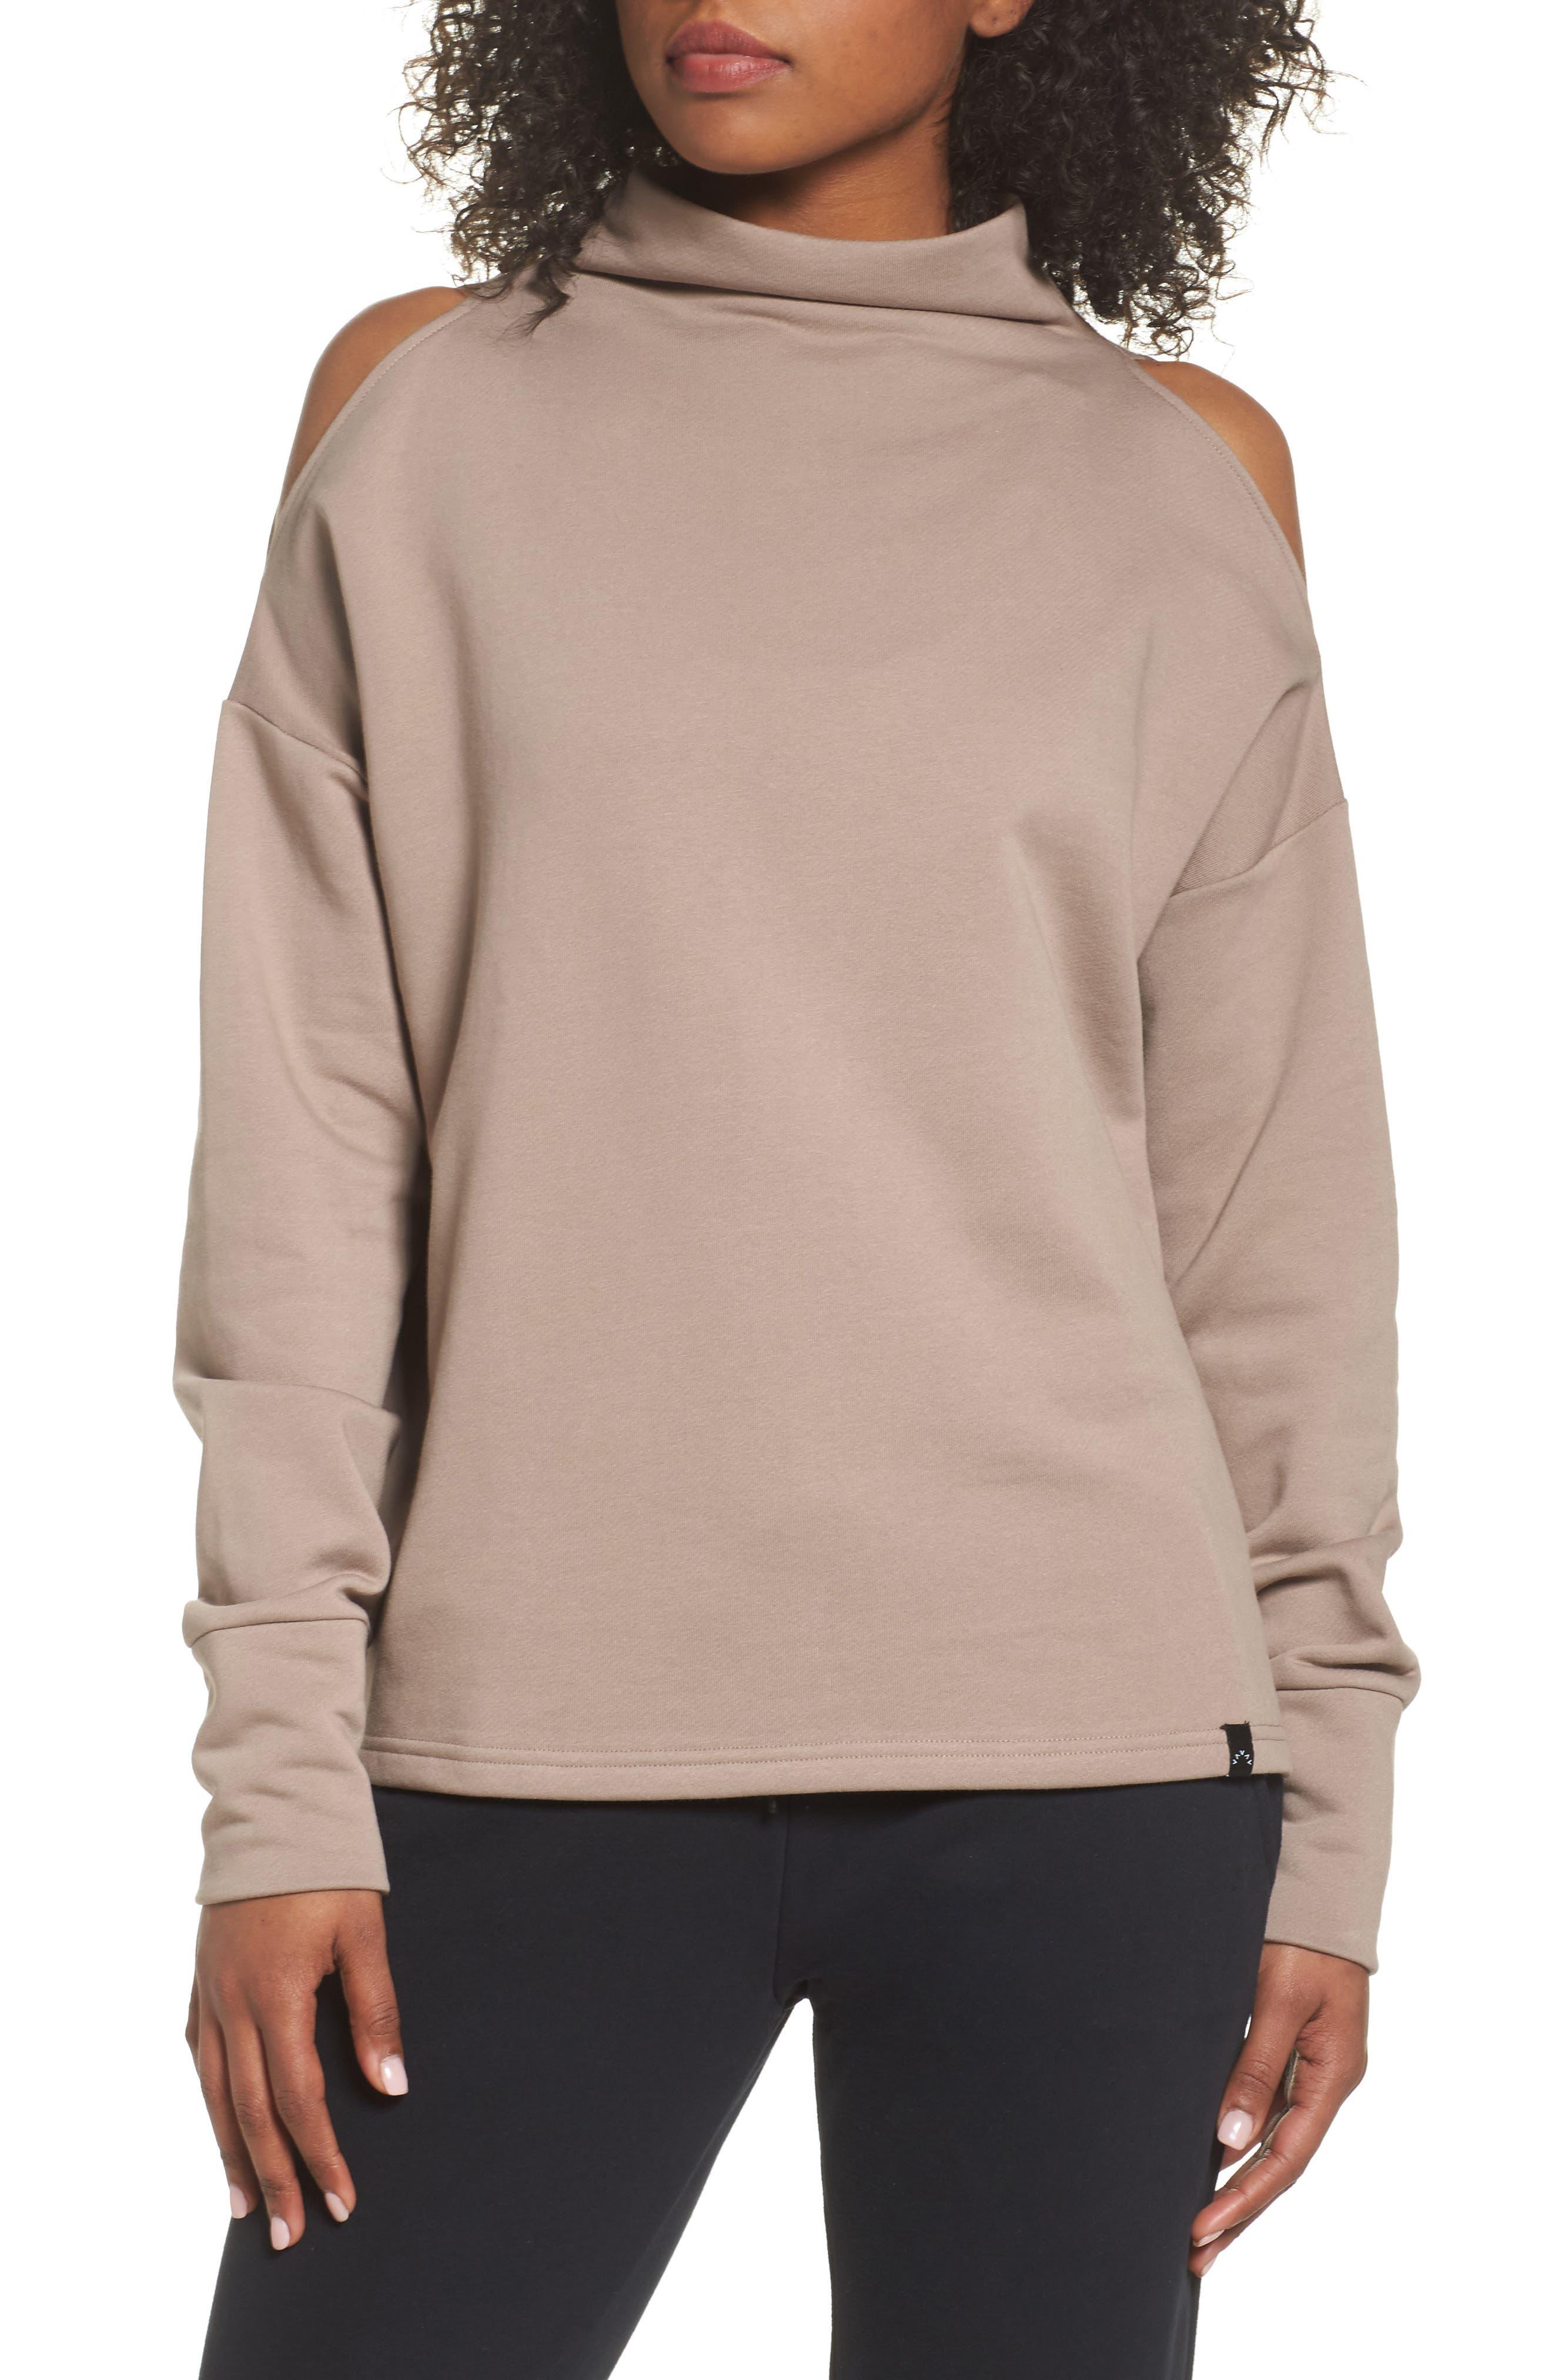 Varley Keystone Cold Shoulder Sweatshirt